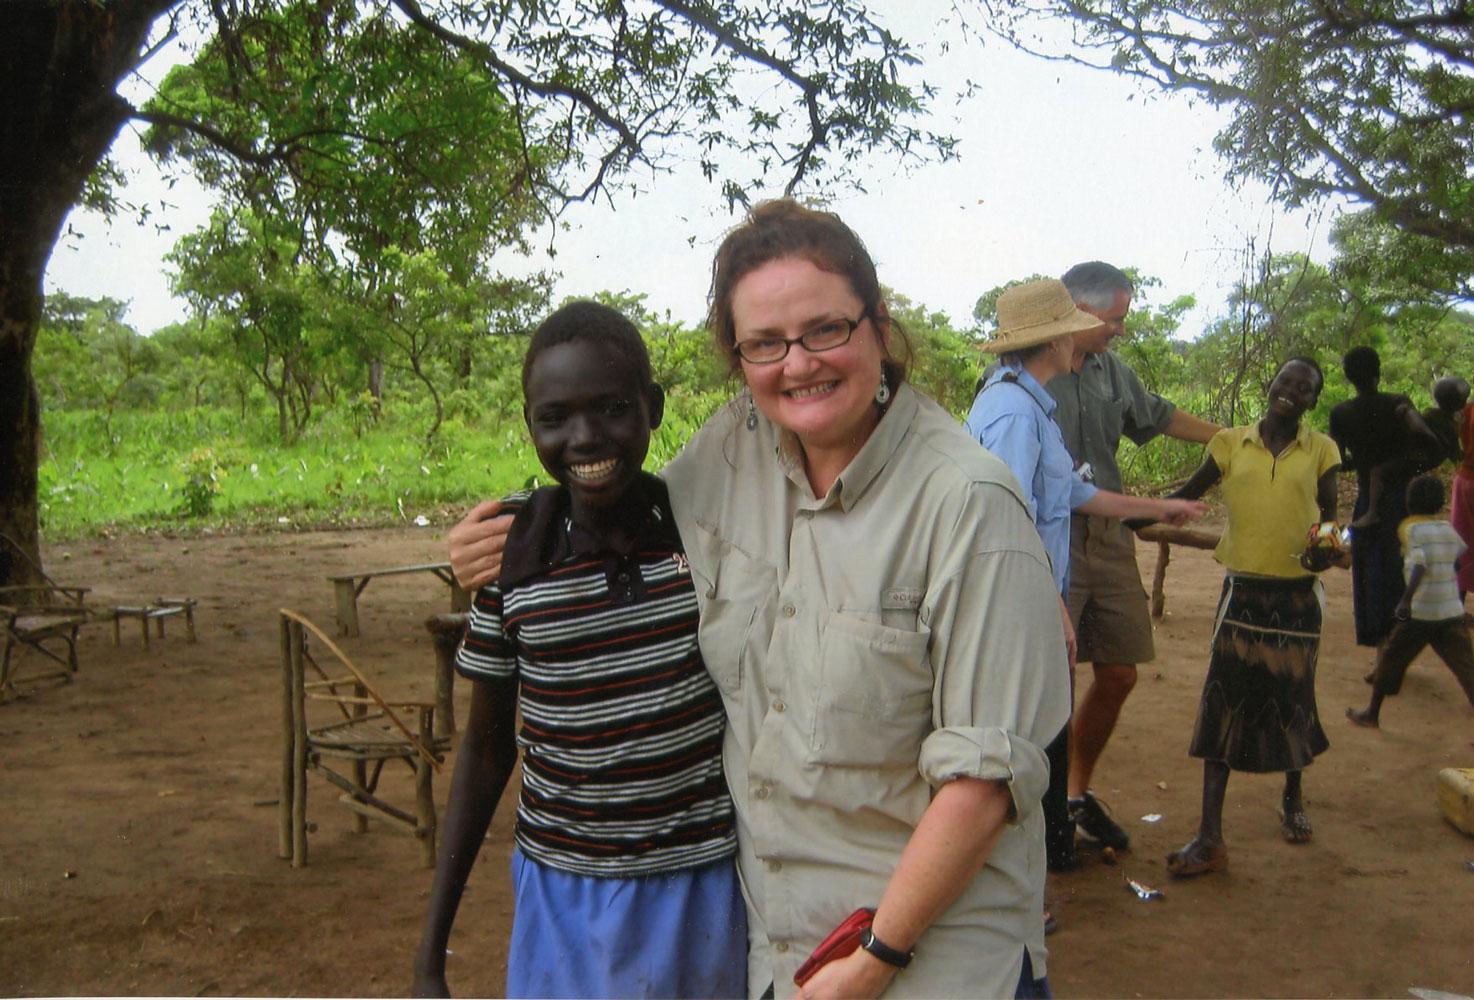 Charlotte-Akin-Sudan001.jpg